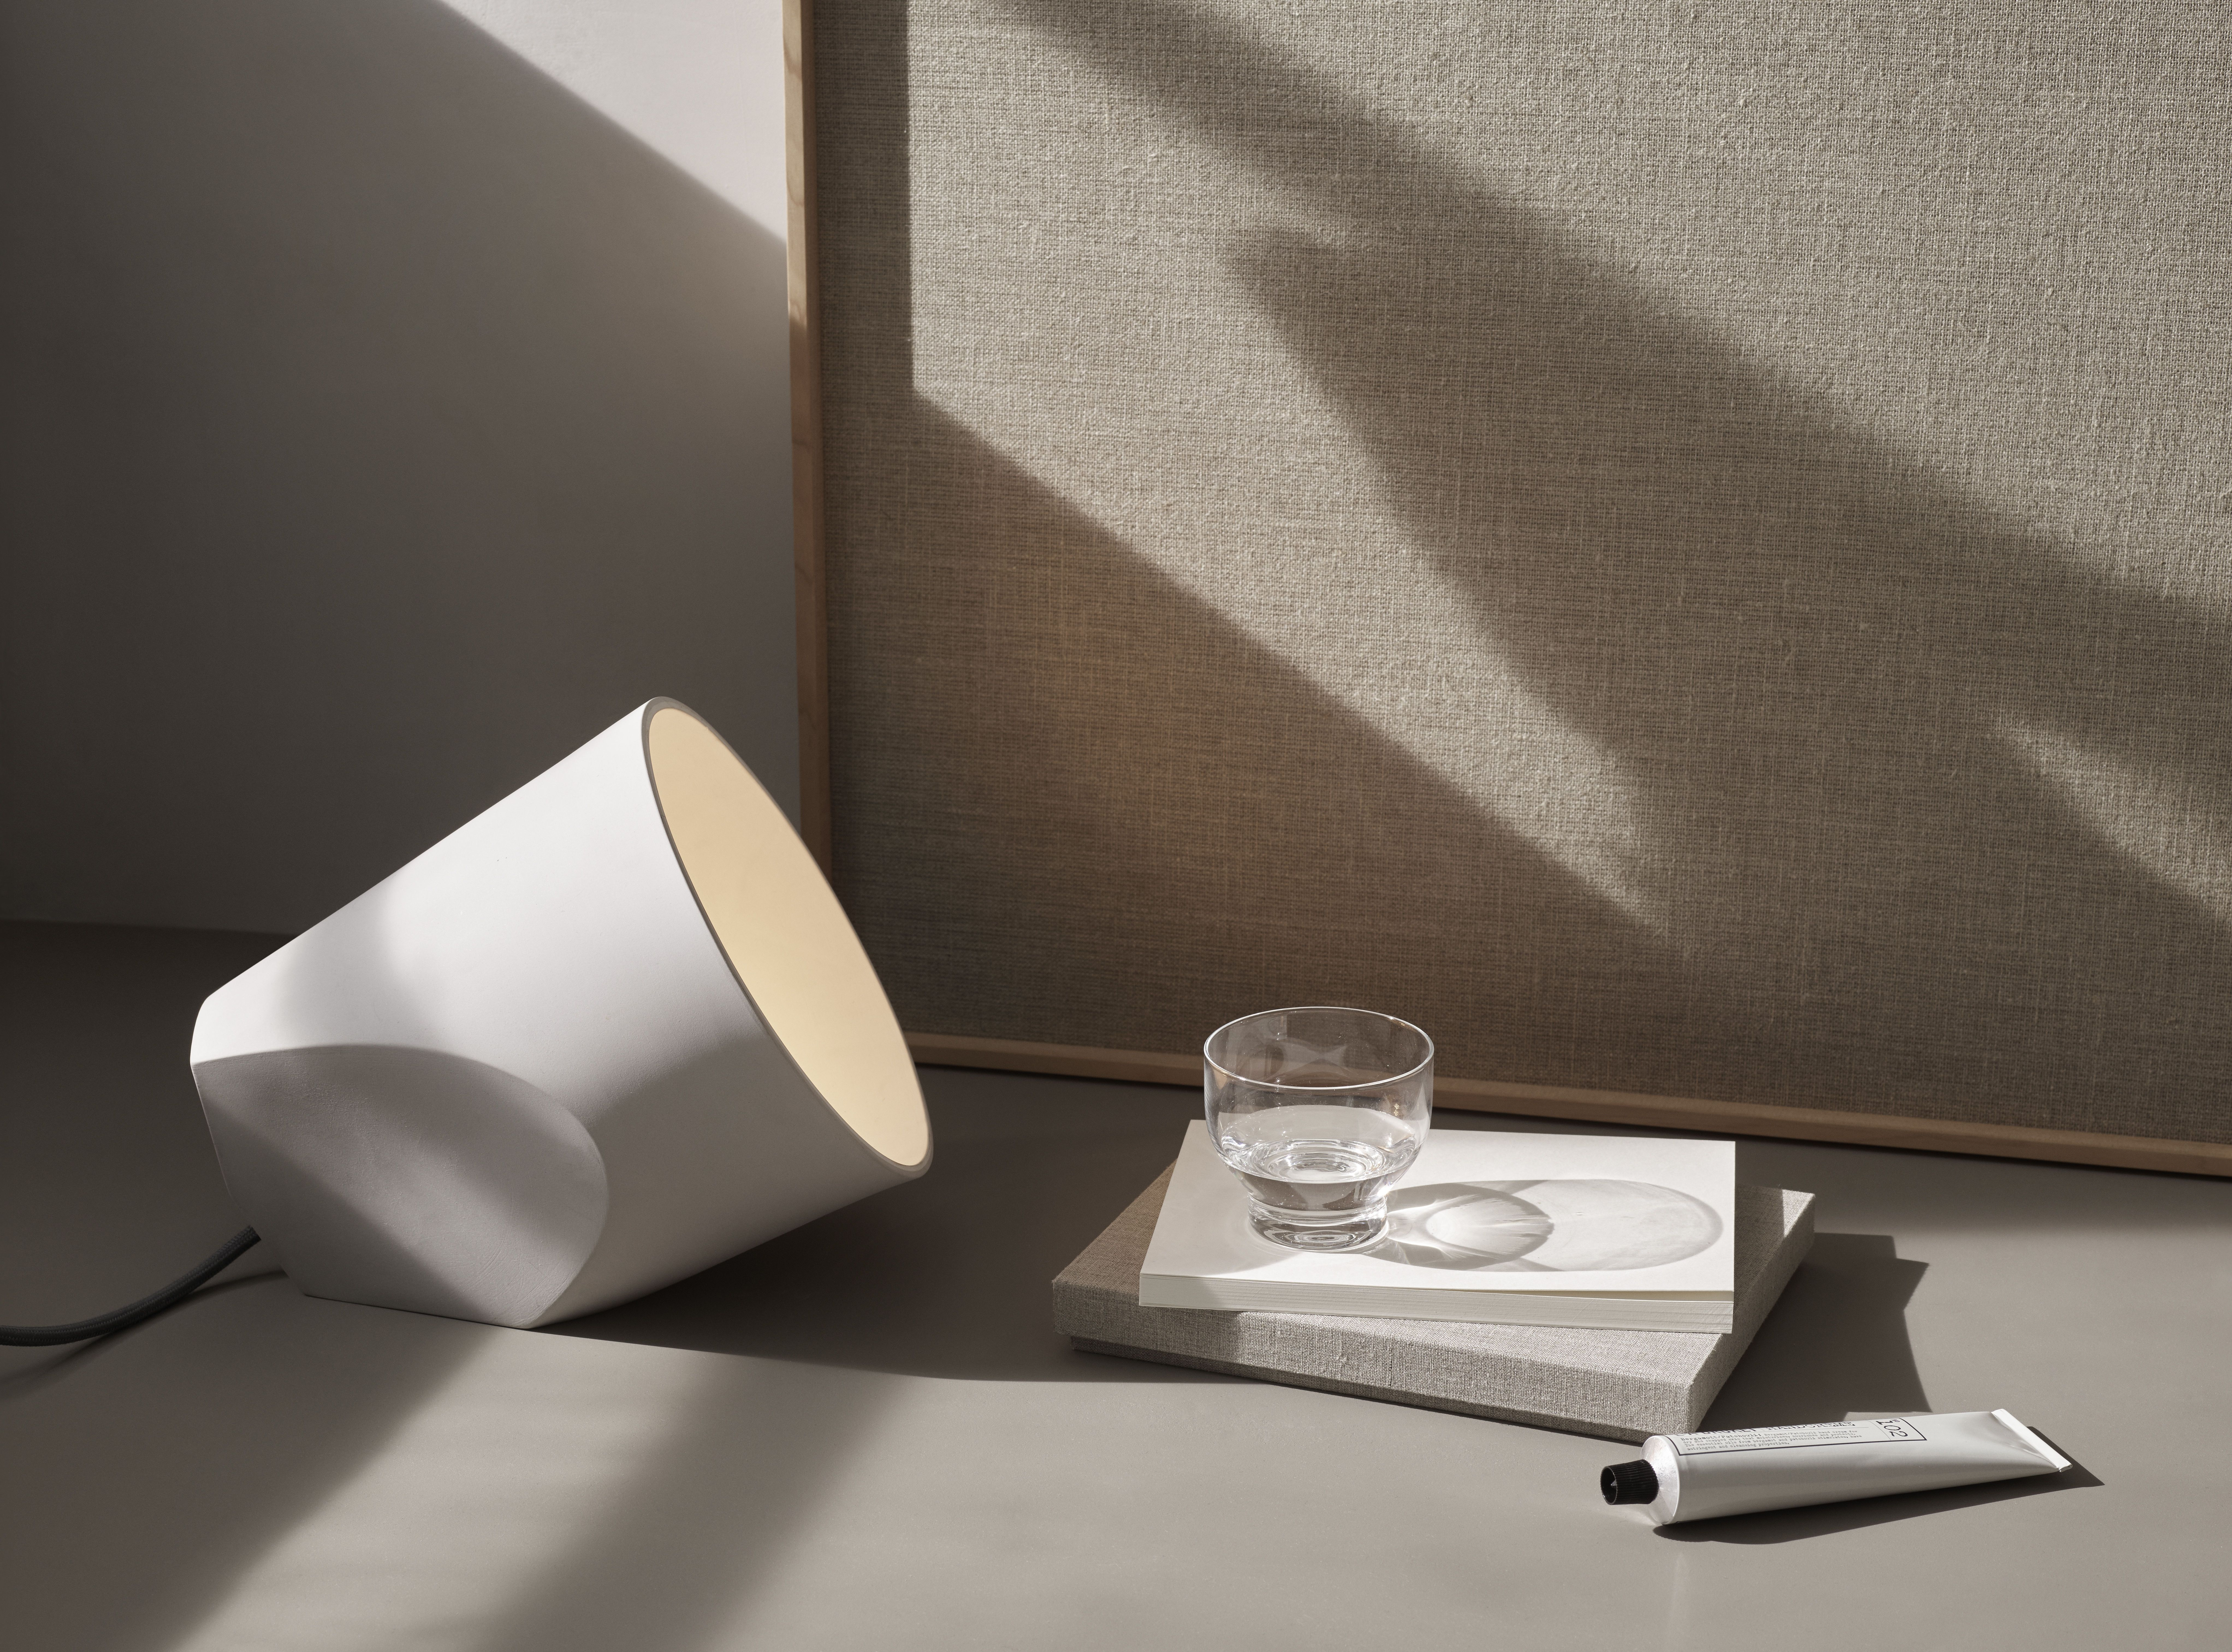 All You Need To Know About Bedroom Lamps Lampes De Table Lampe De Chevet Design Abat Jour Design